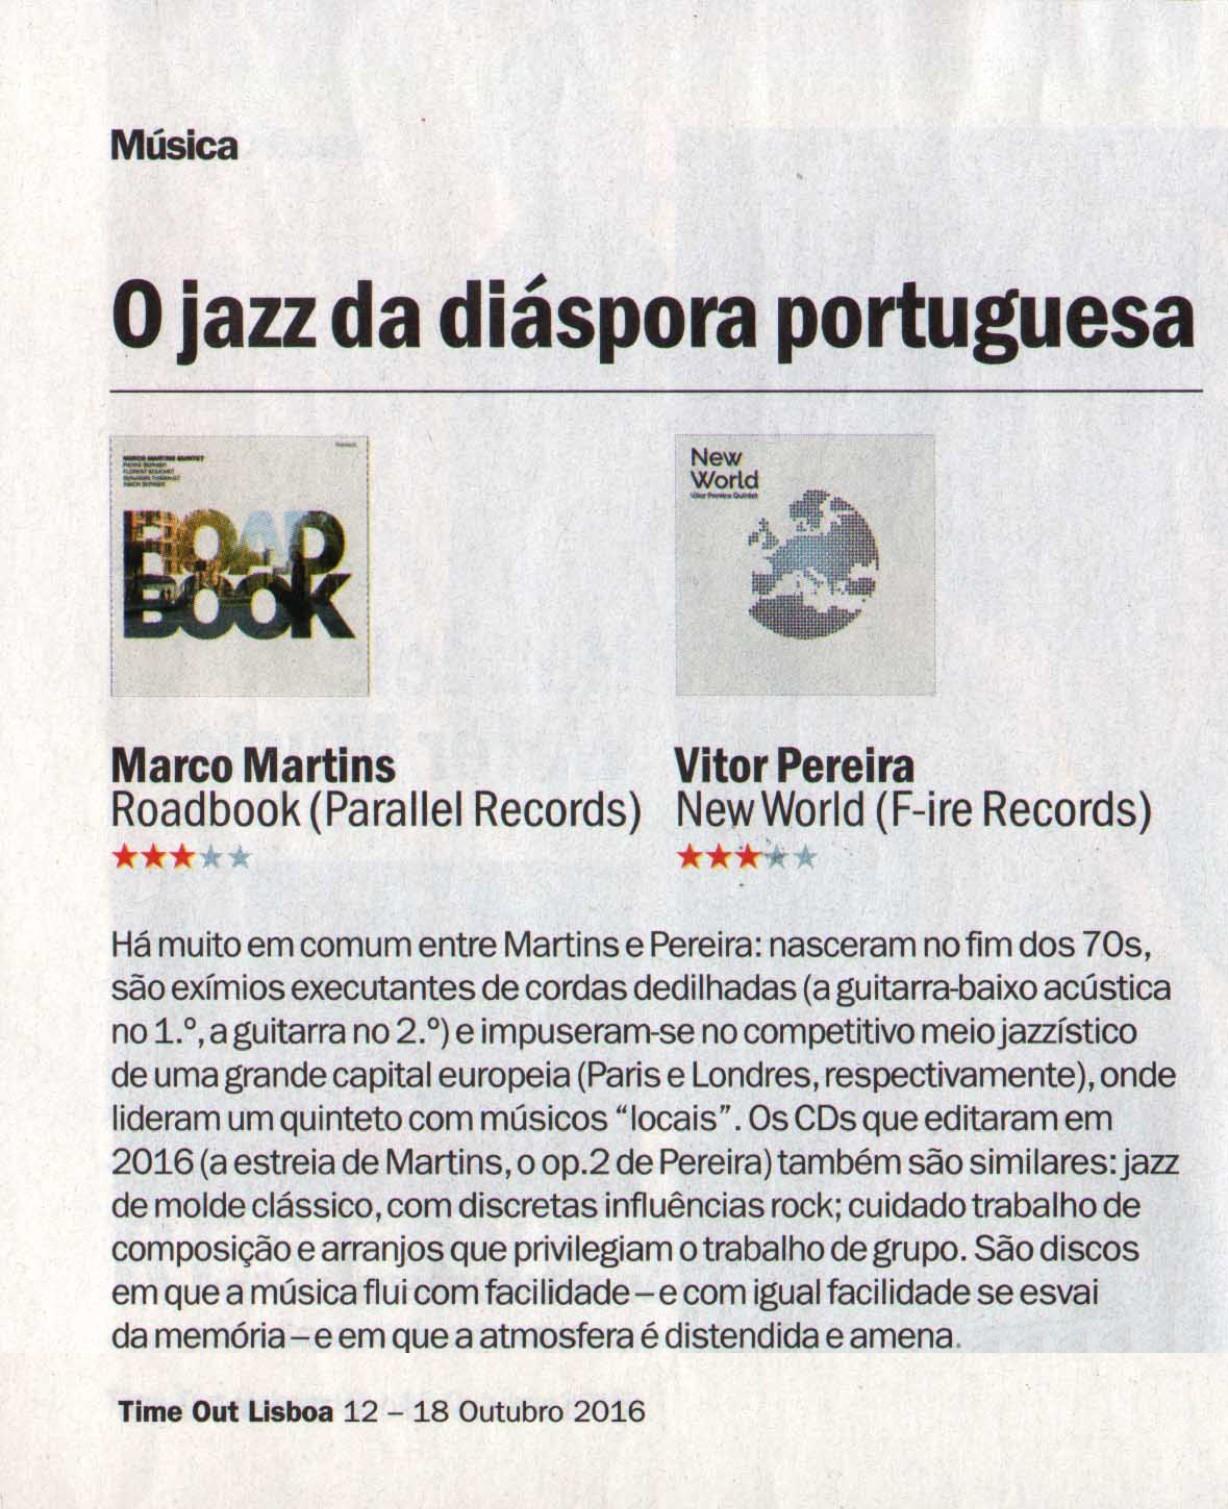 Time Out Lisboa 12-18 Outubro 2016